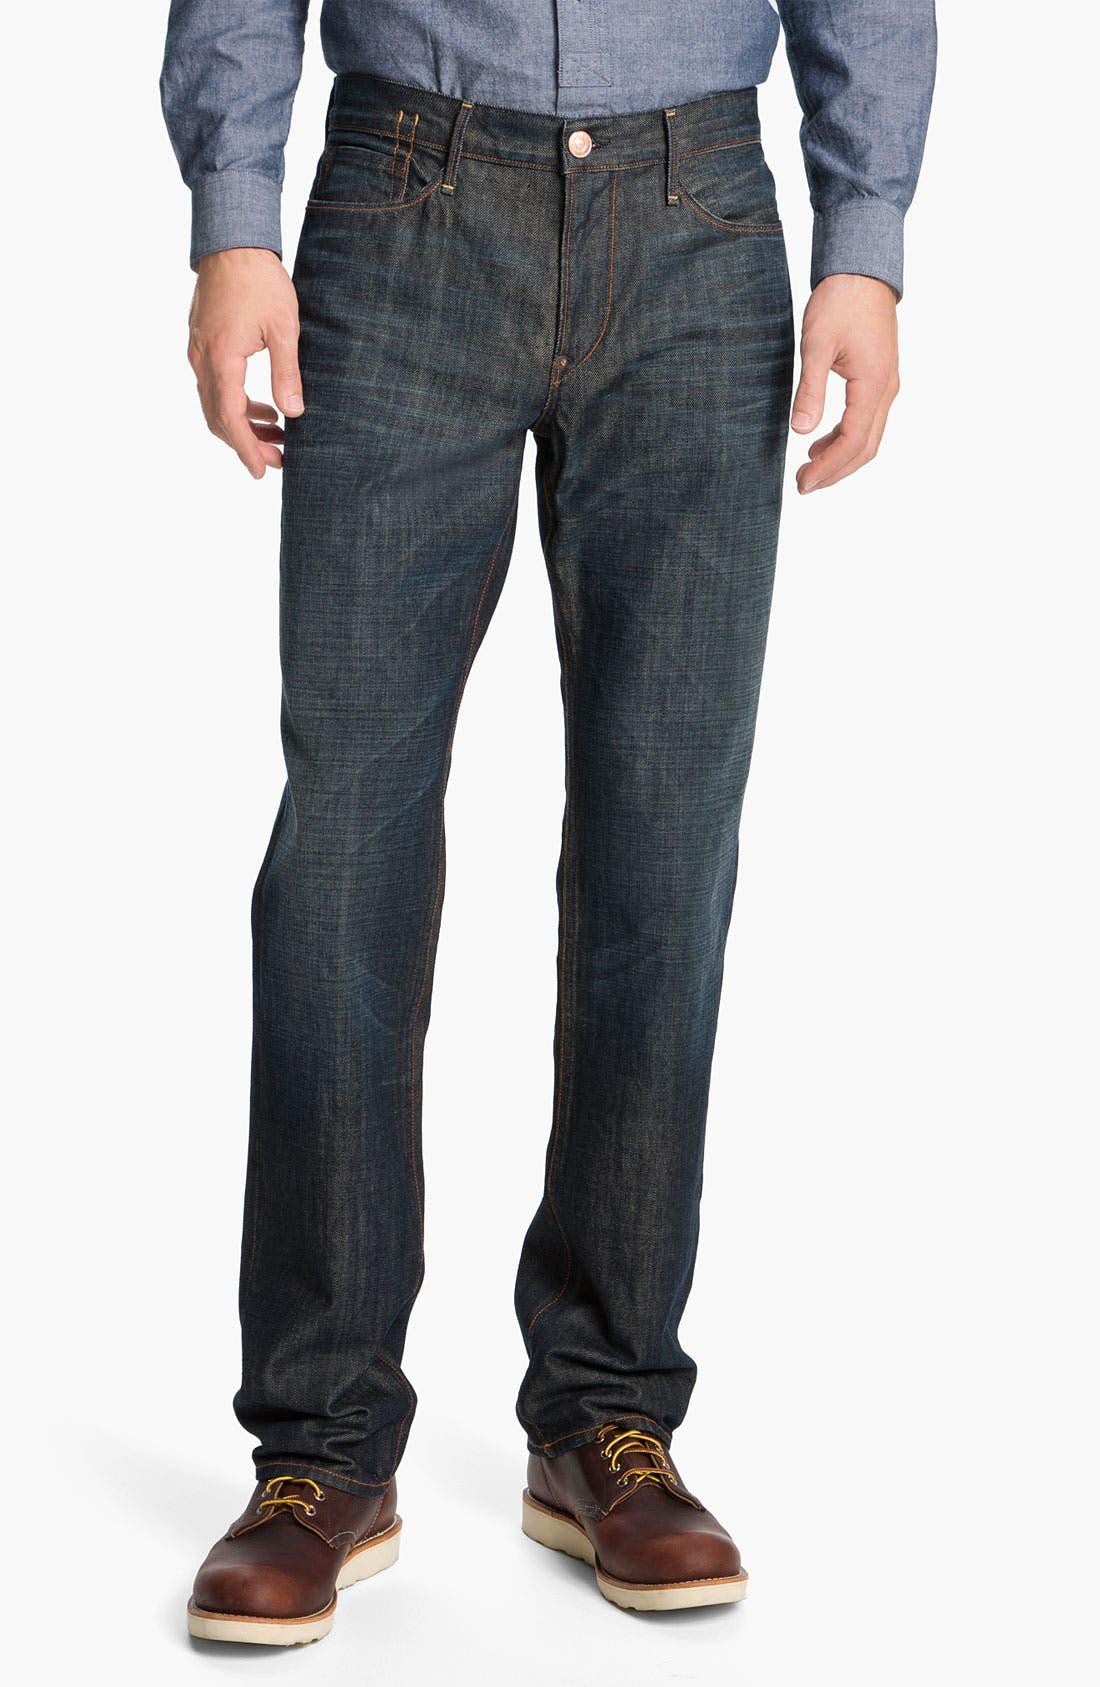 Main Image - Earnest Sewn 'Dexter' Relaxed Straight Leg Jeans (Maz Dark)